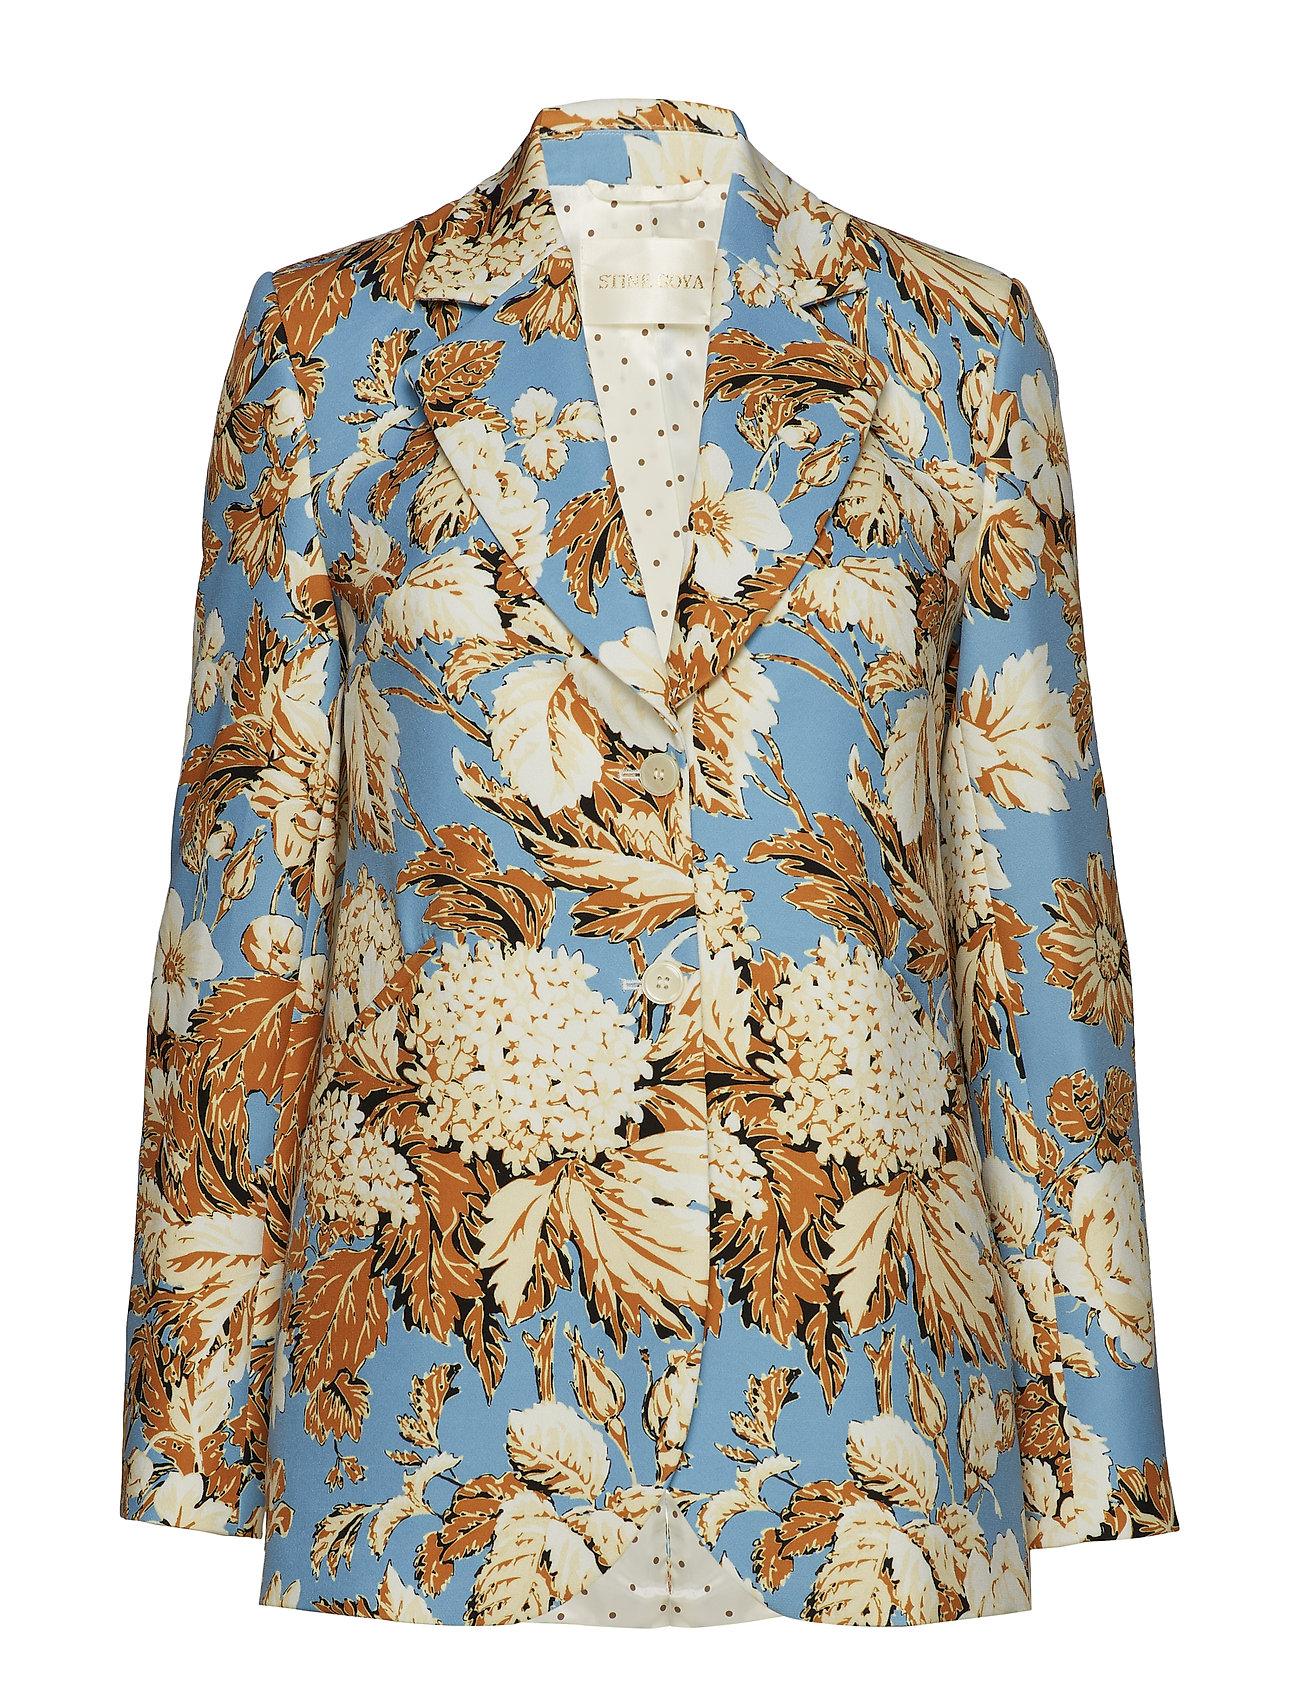 STINE GOYA Florence, 529 Printed Tailoring - BLUE HORTENSIA